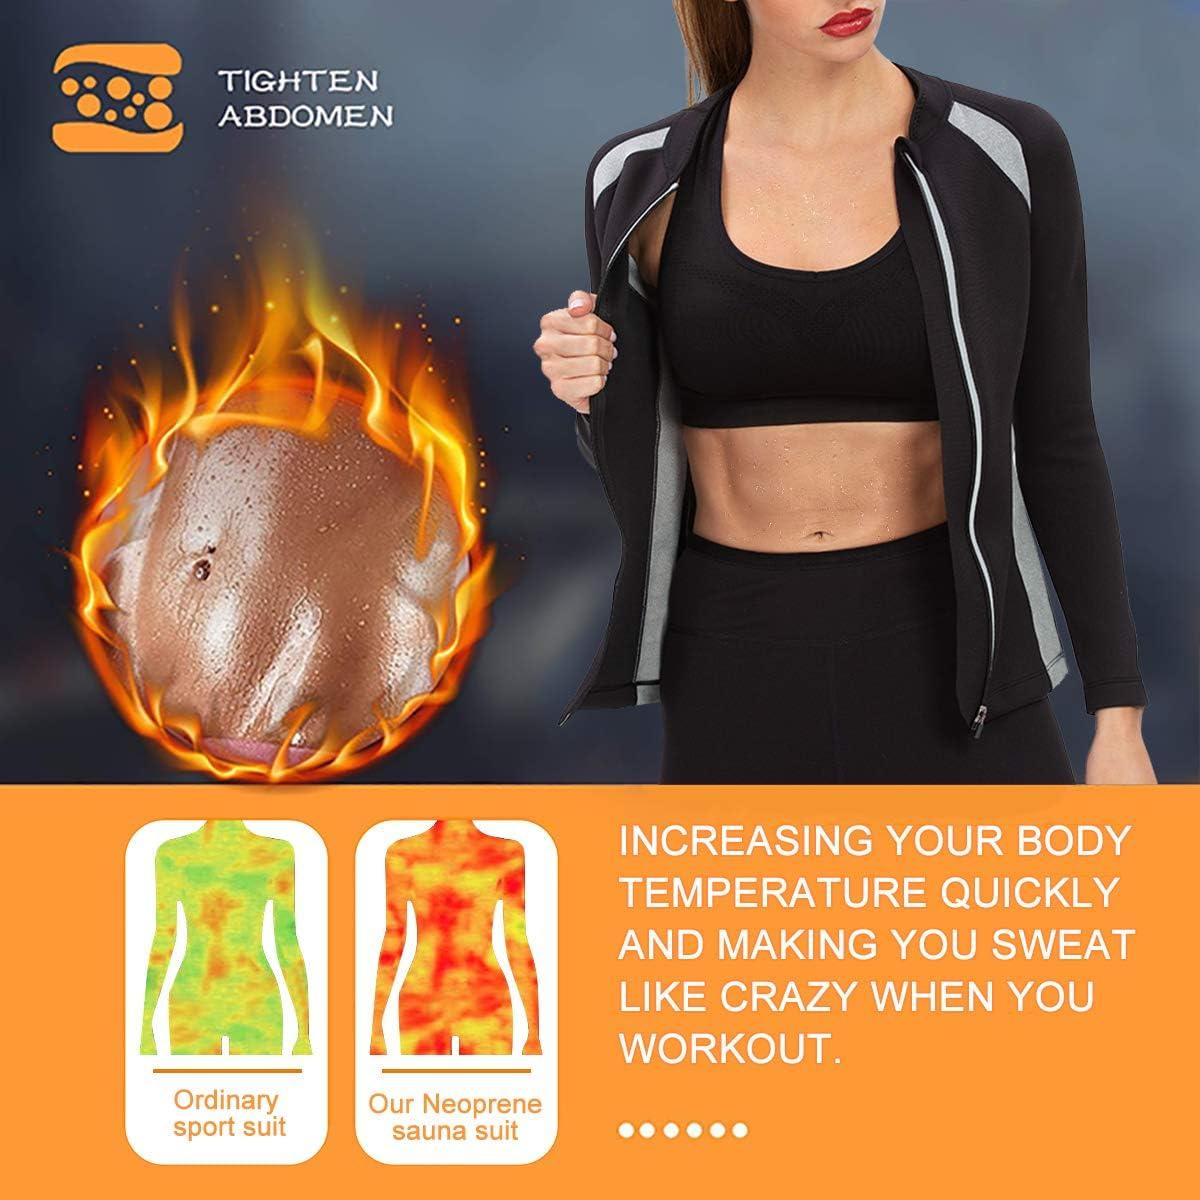 DoLoveY Sauna Jacket For Women Hot Sweat Workout Shirt Body Shaper Neoprene Long Sleeve Slim Sport Top : Sports & Outdoors